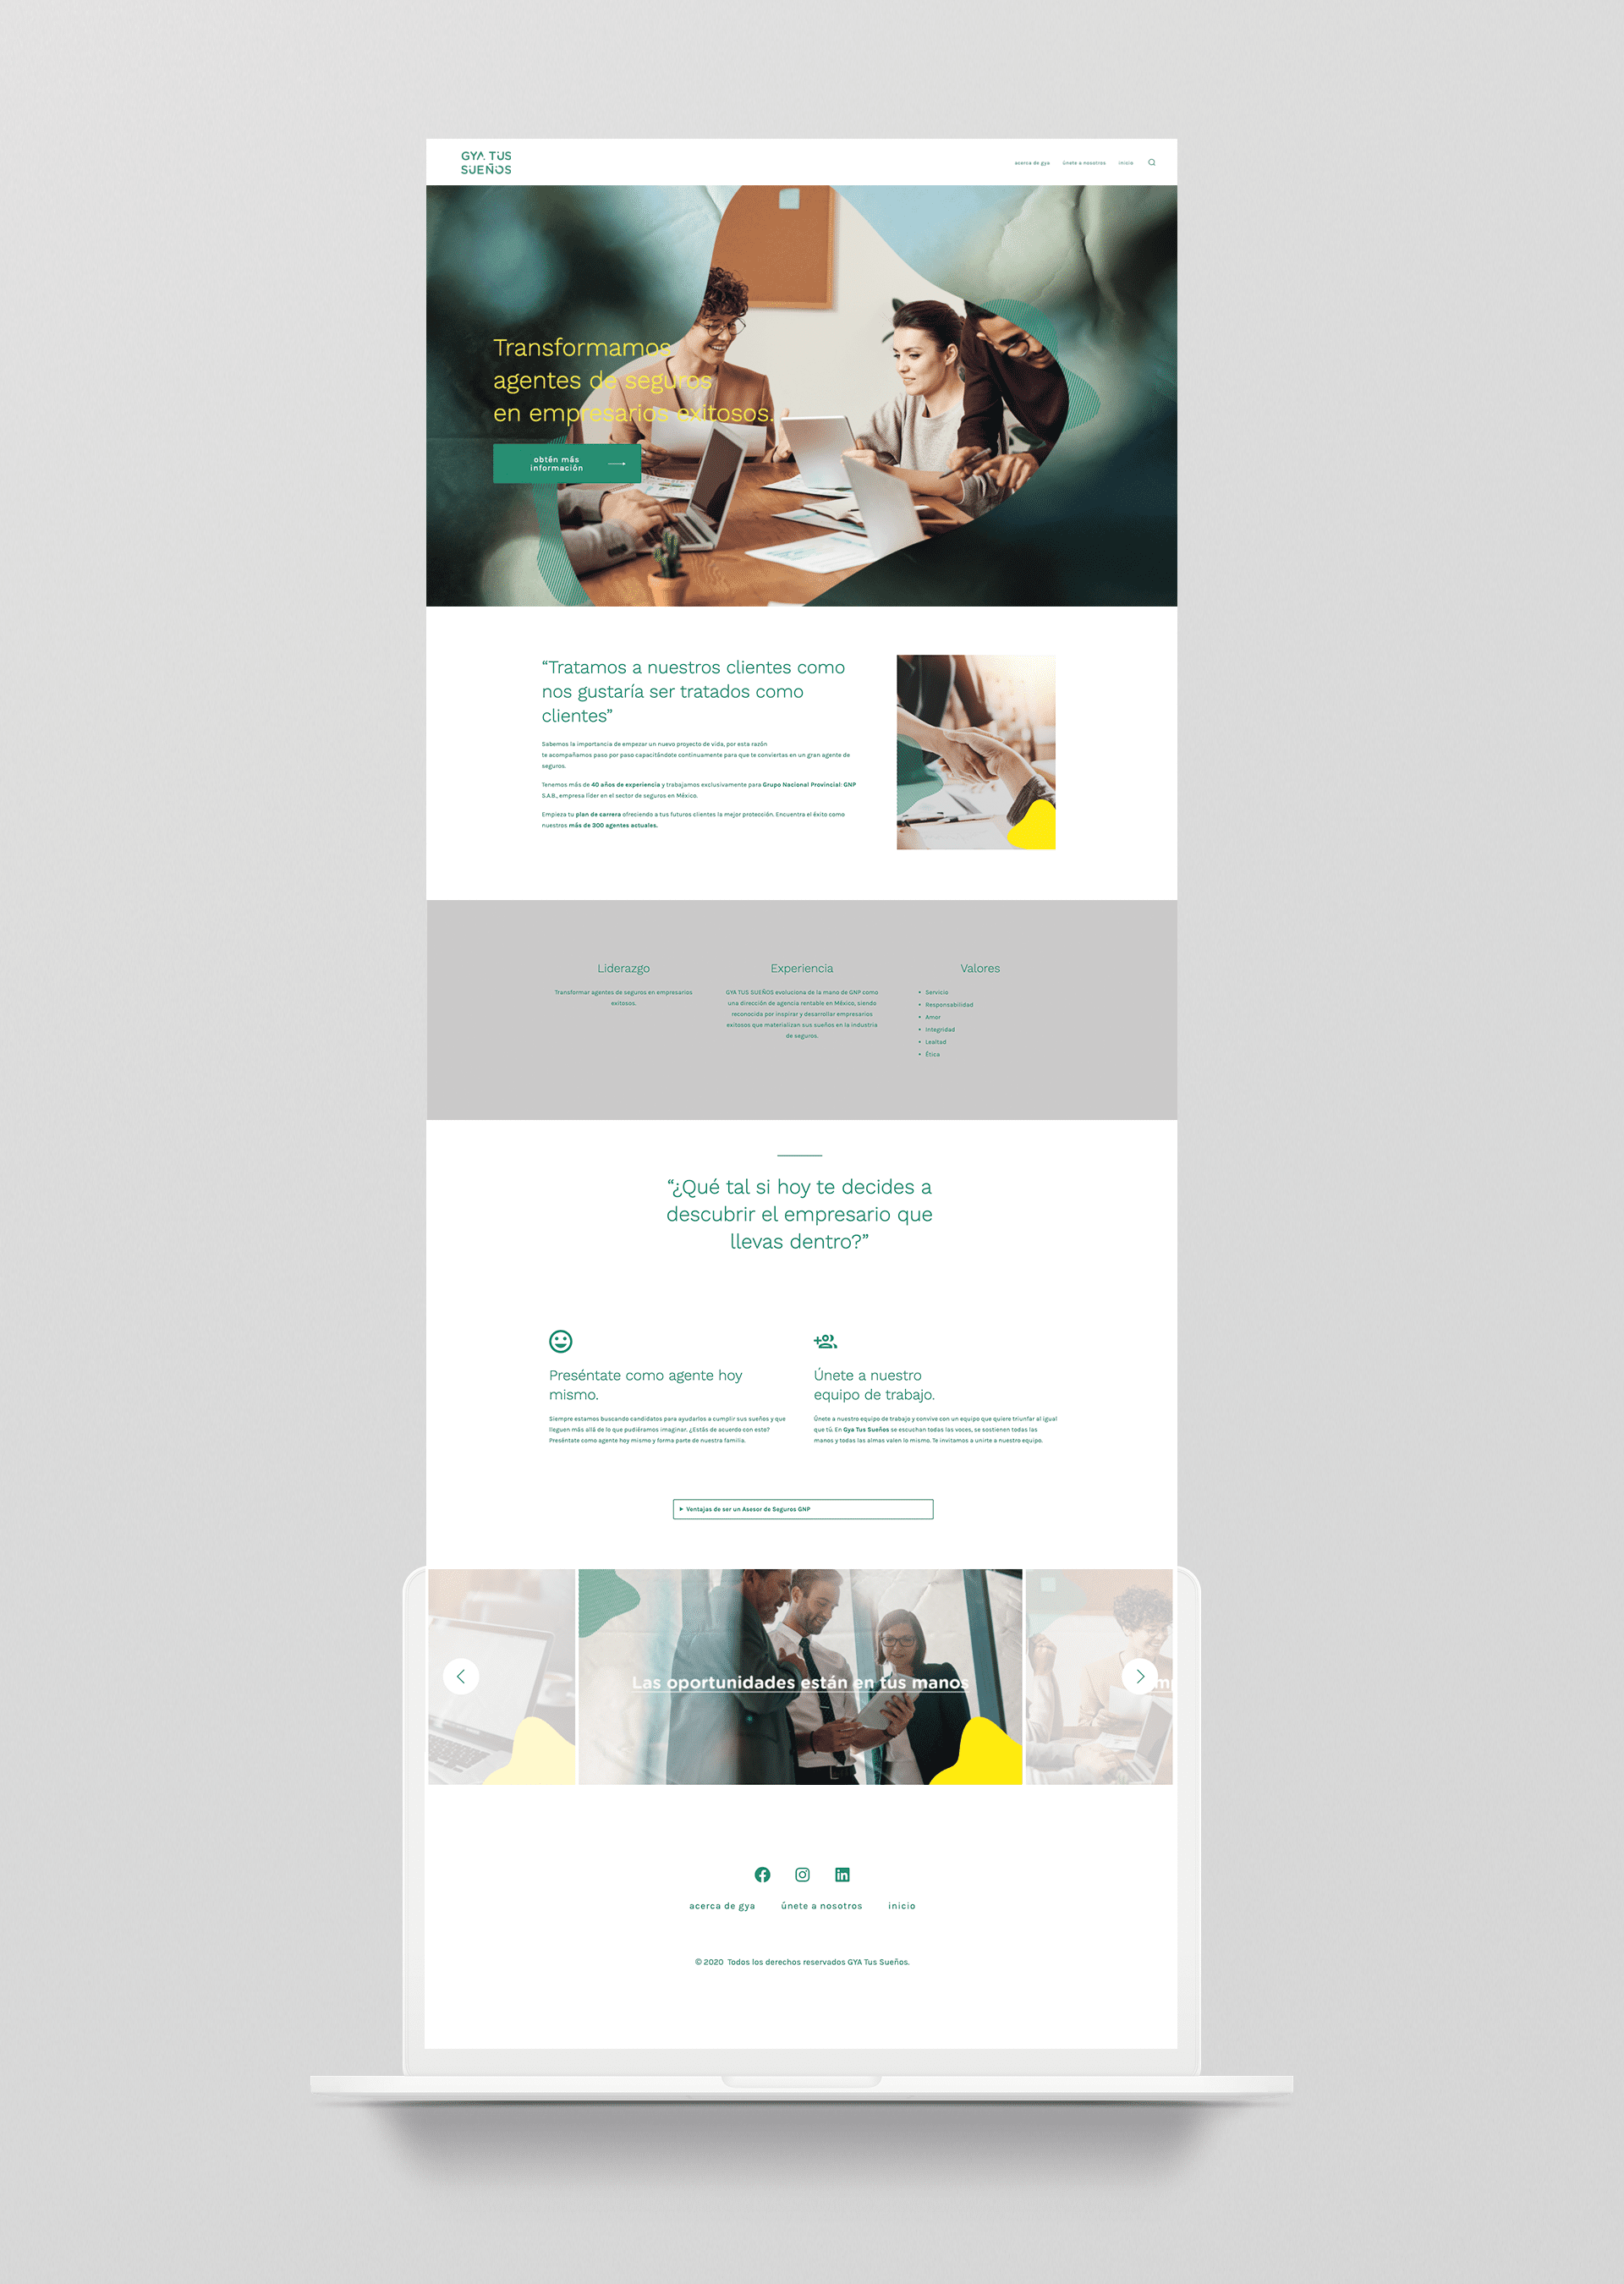 web-responsive-02-gya-yoenpaperland